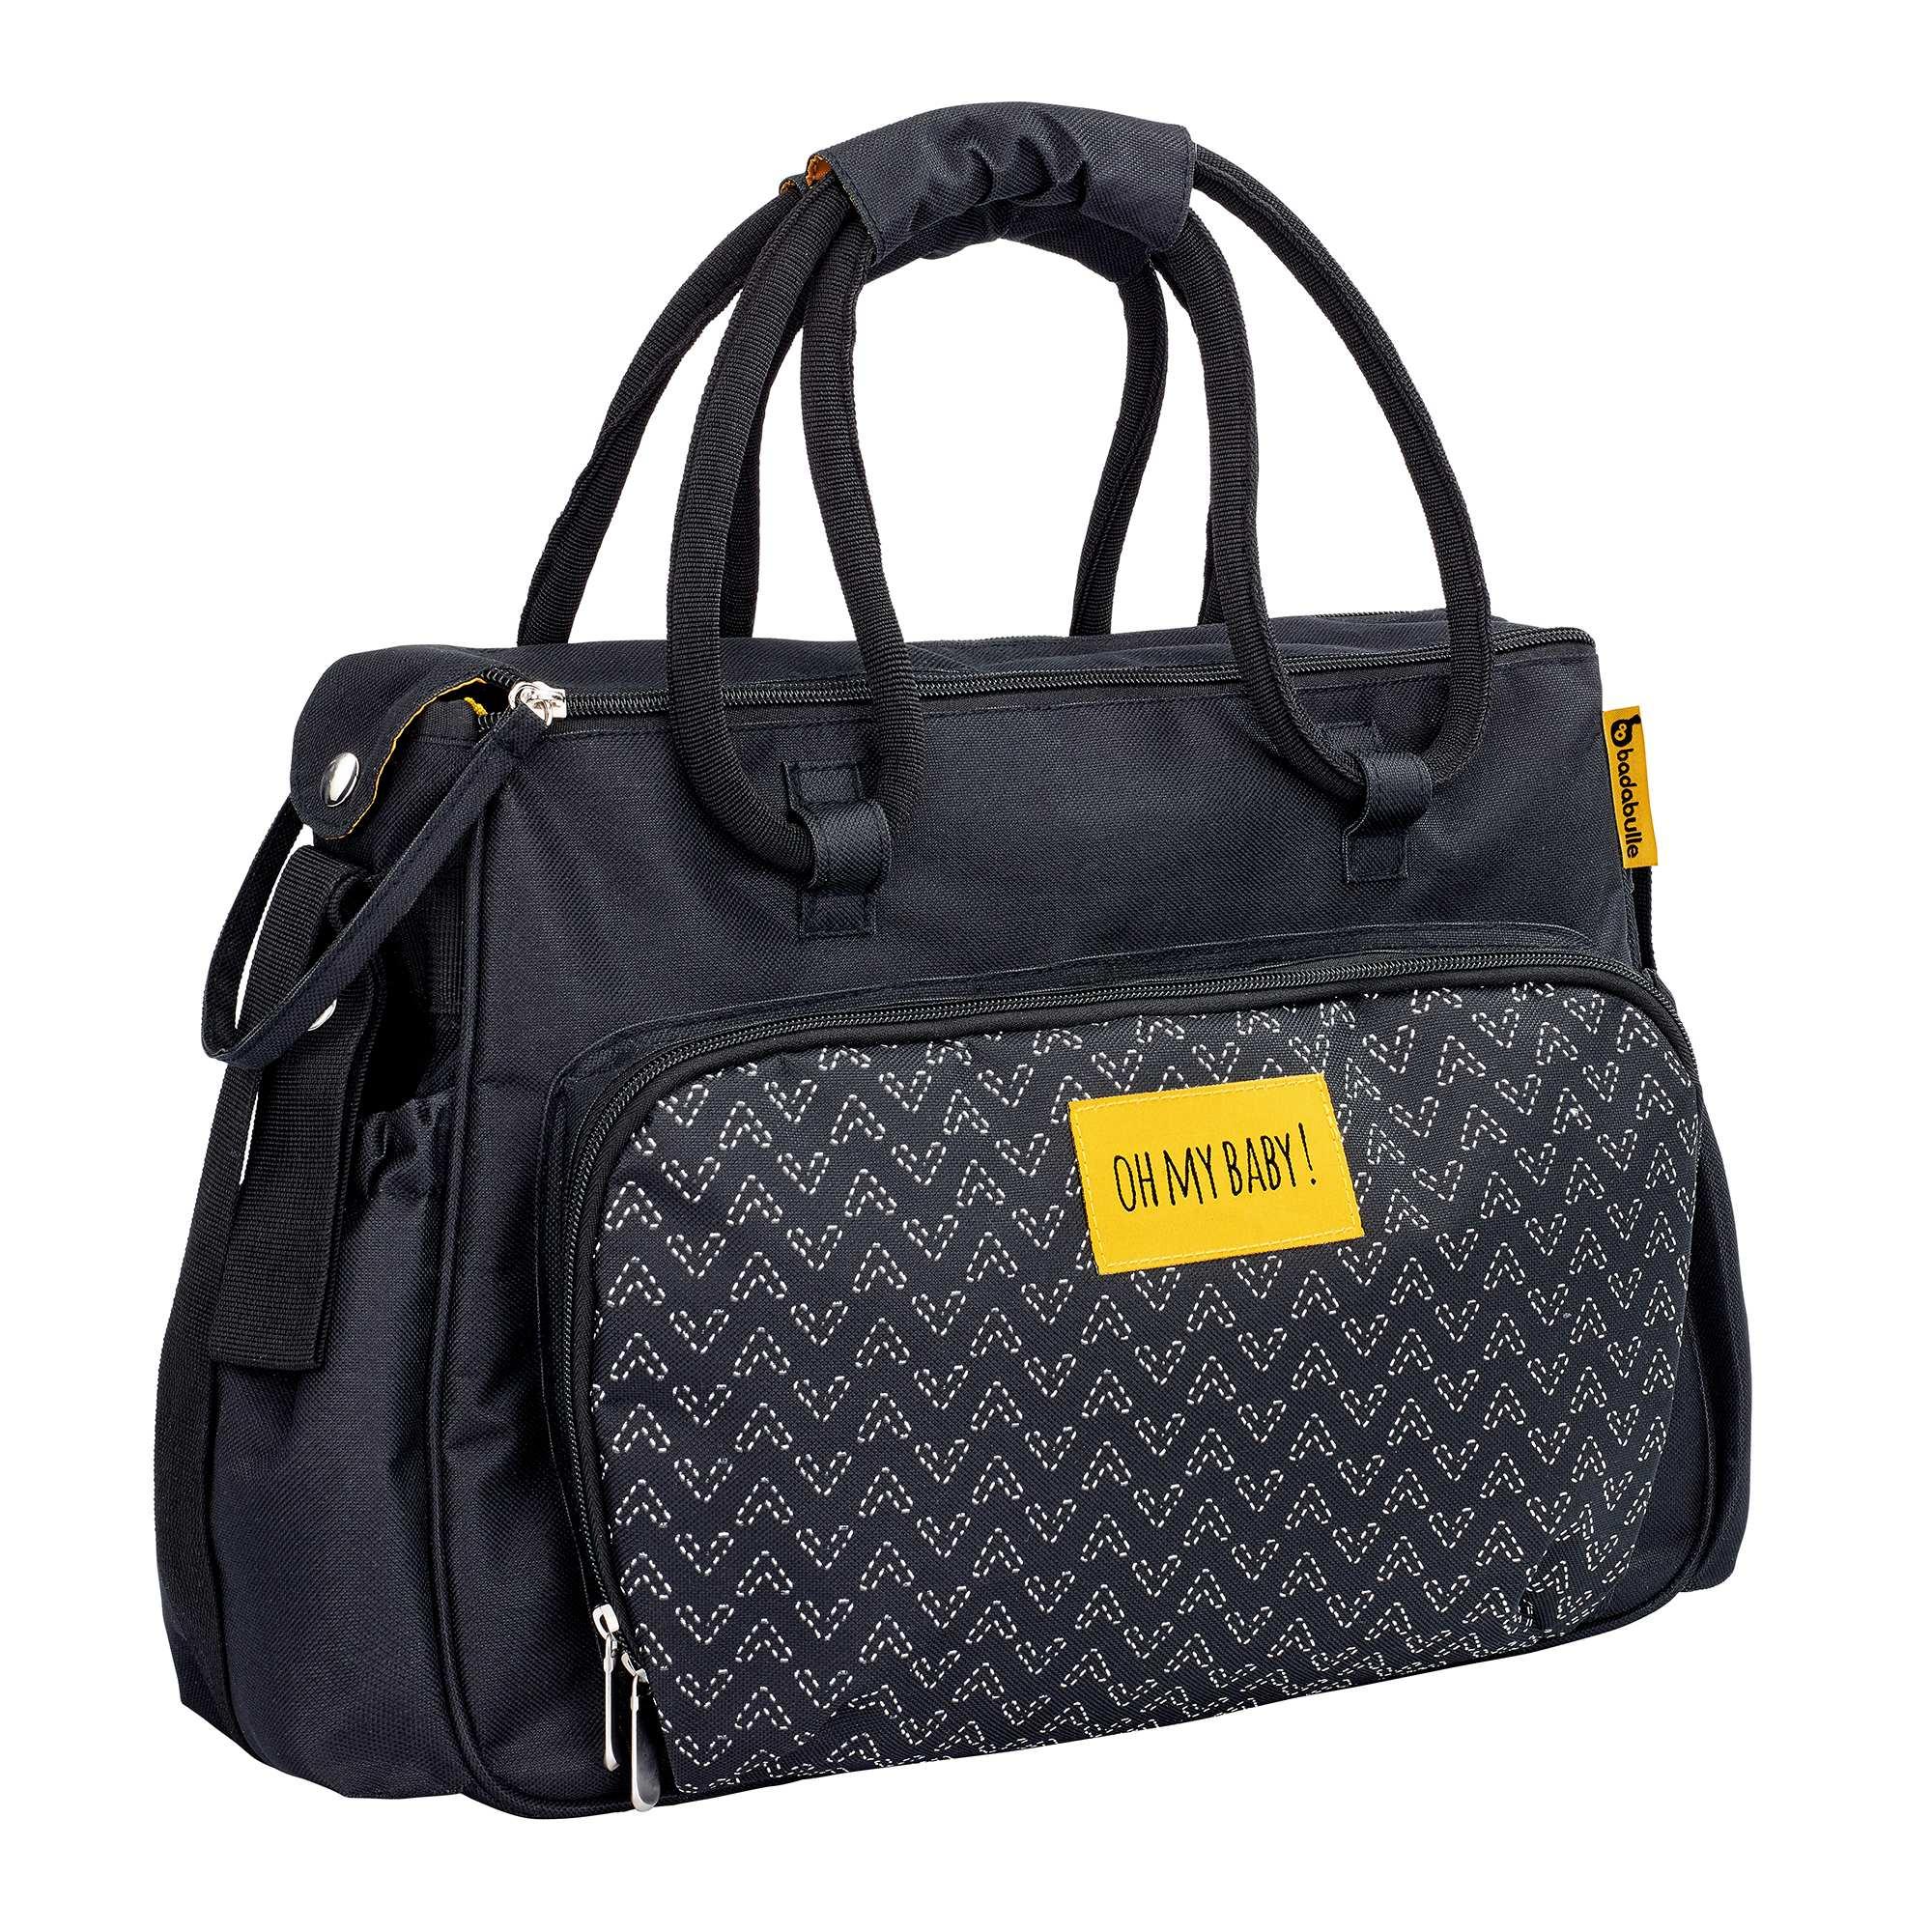 sac langer imprim avec accessoires 39 badabulle 39 b b fille noir kiabi 35 00. Black Bedroom Furniture Sets. Home Design Ideas